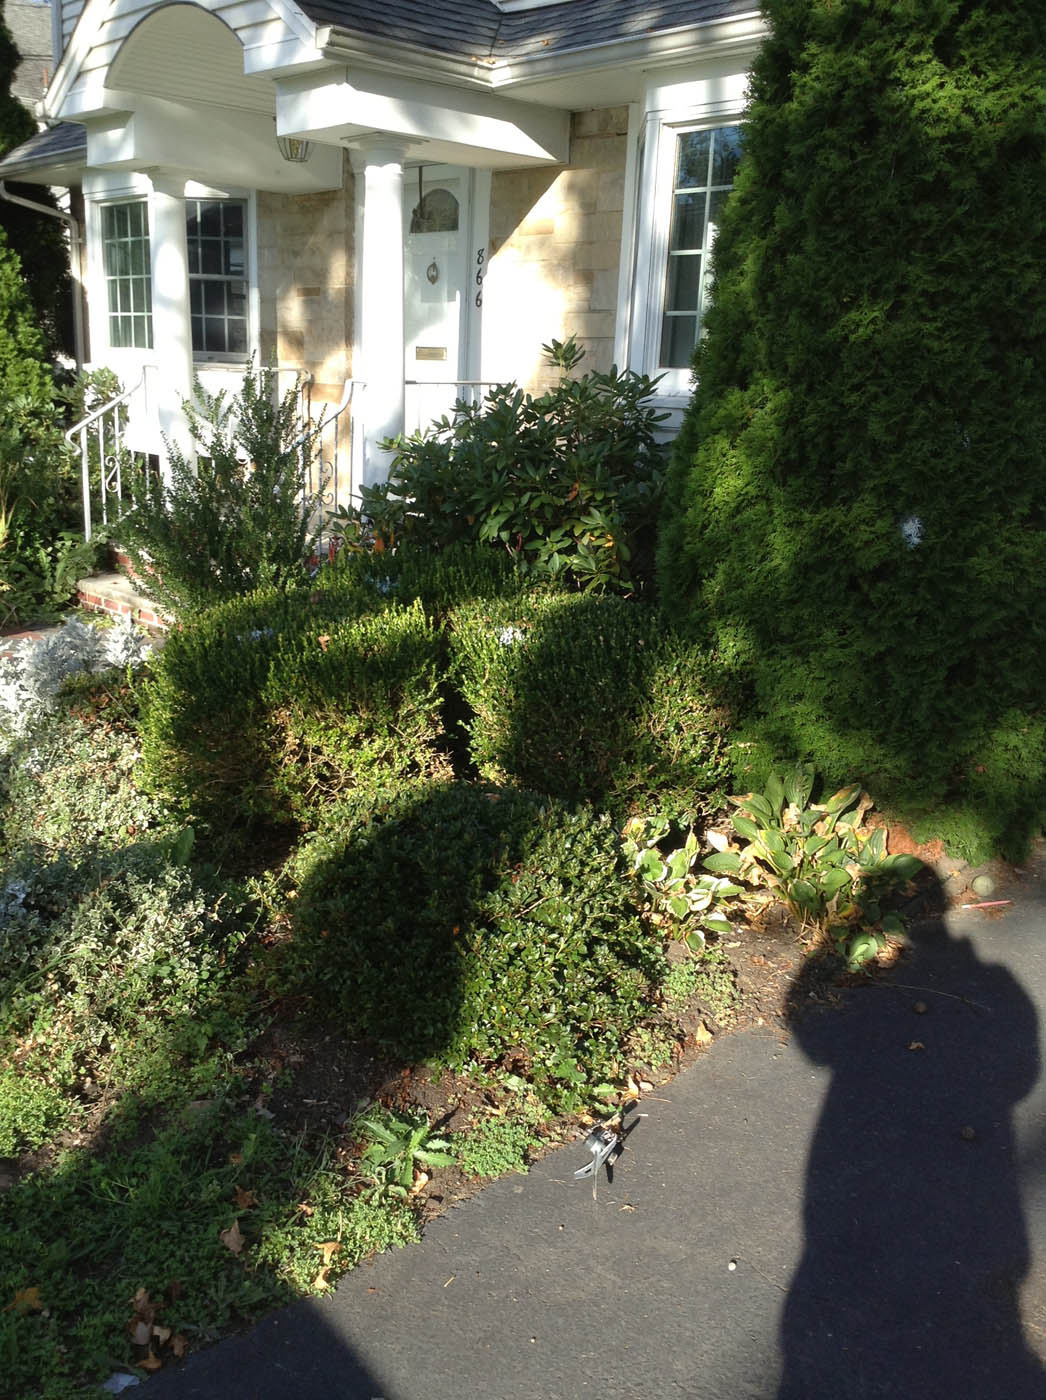 1357cd6ab972ff6e086e_Landscaping_Walkway_Before.jpg